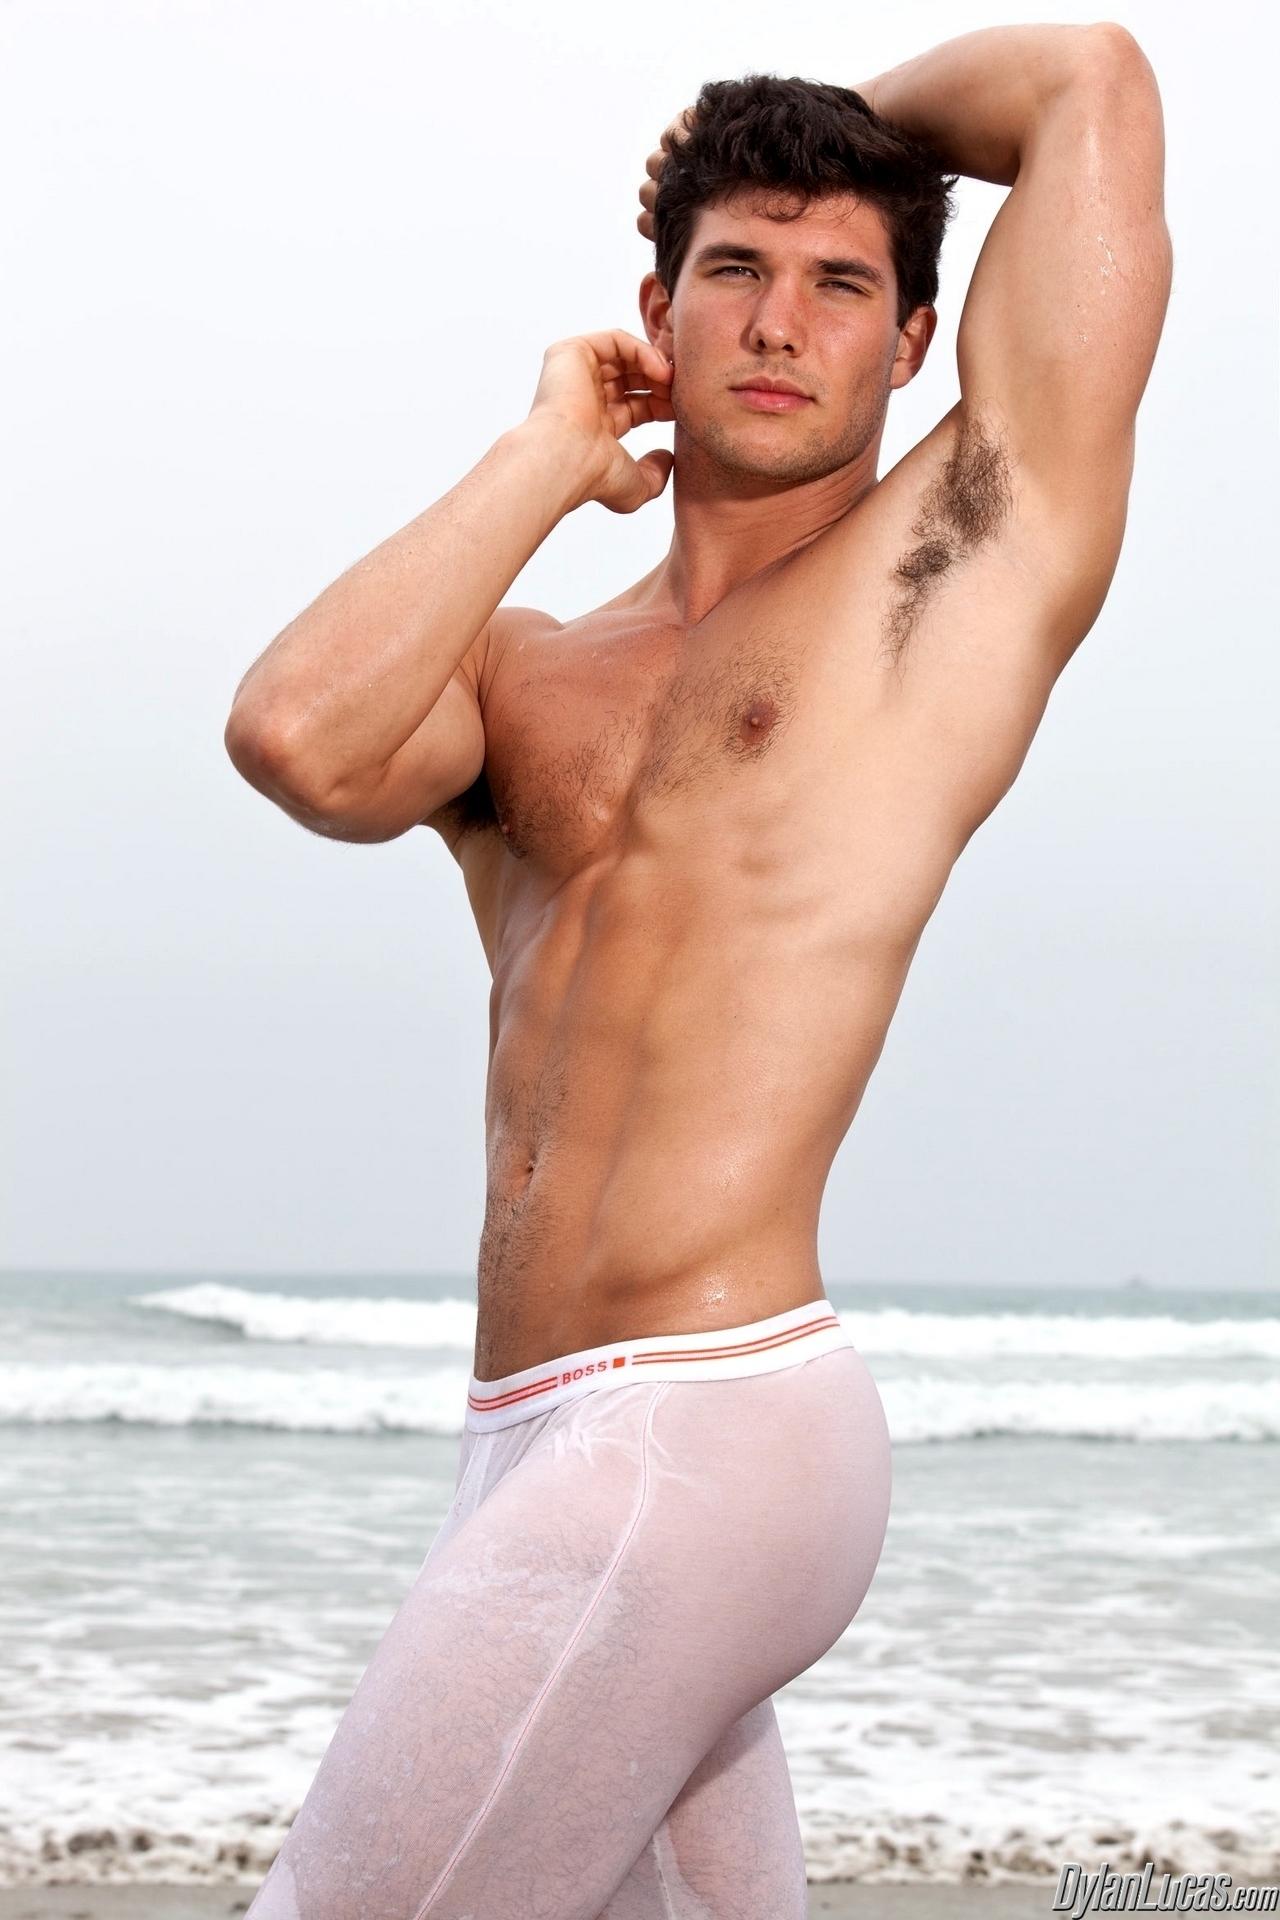 Erotic Male Gay image #1533